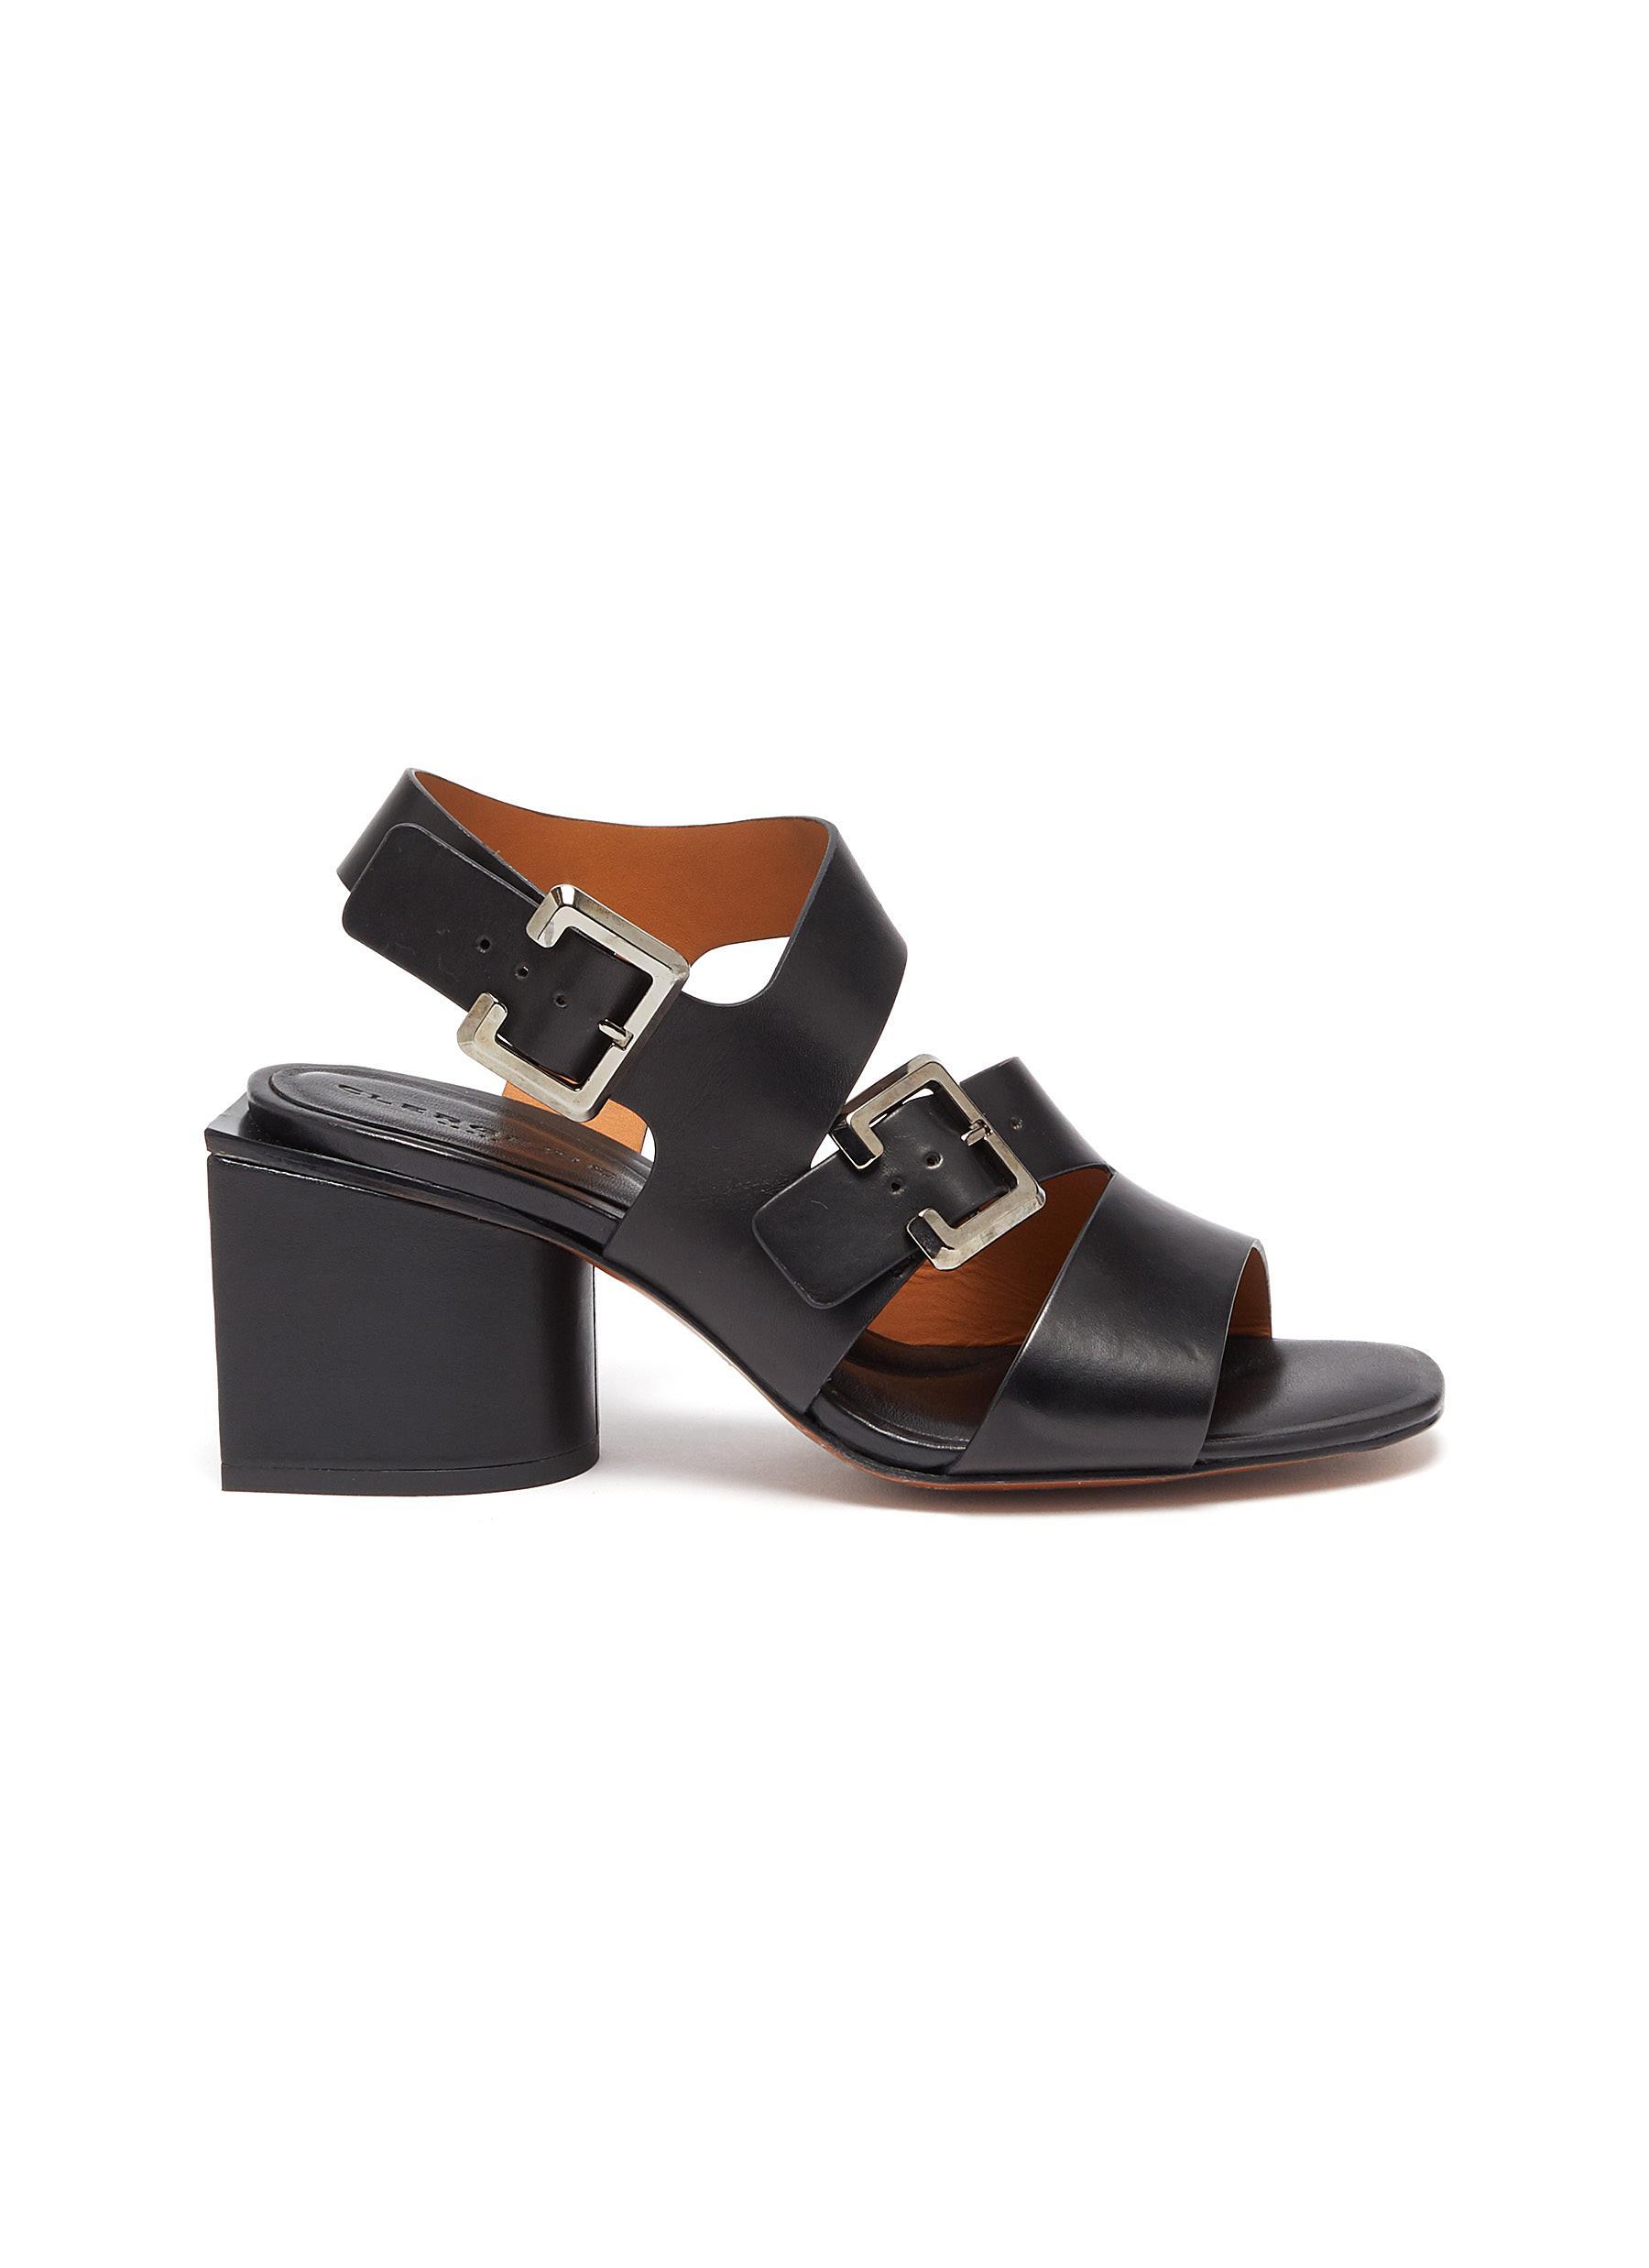 Clergerie Mid Heels Ellie block heel leather sandals